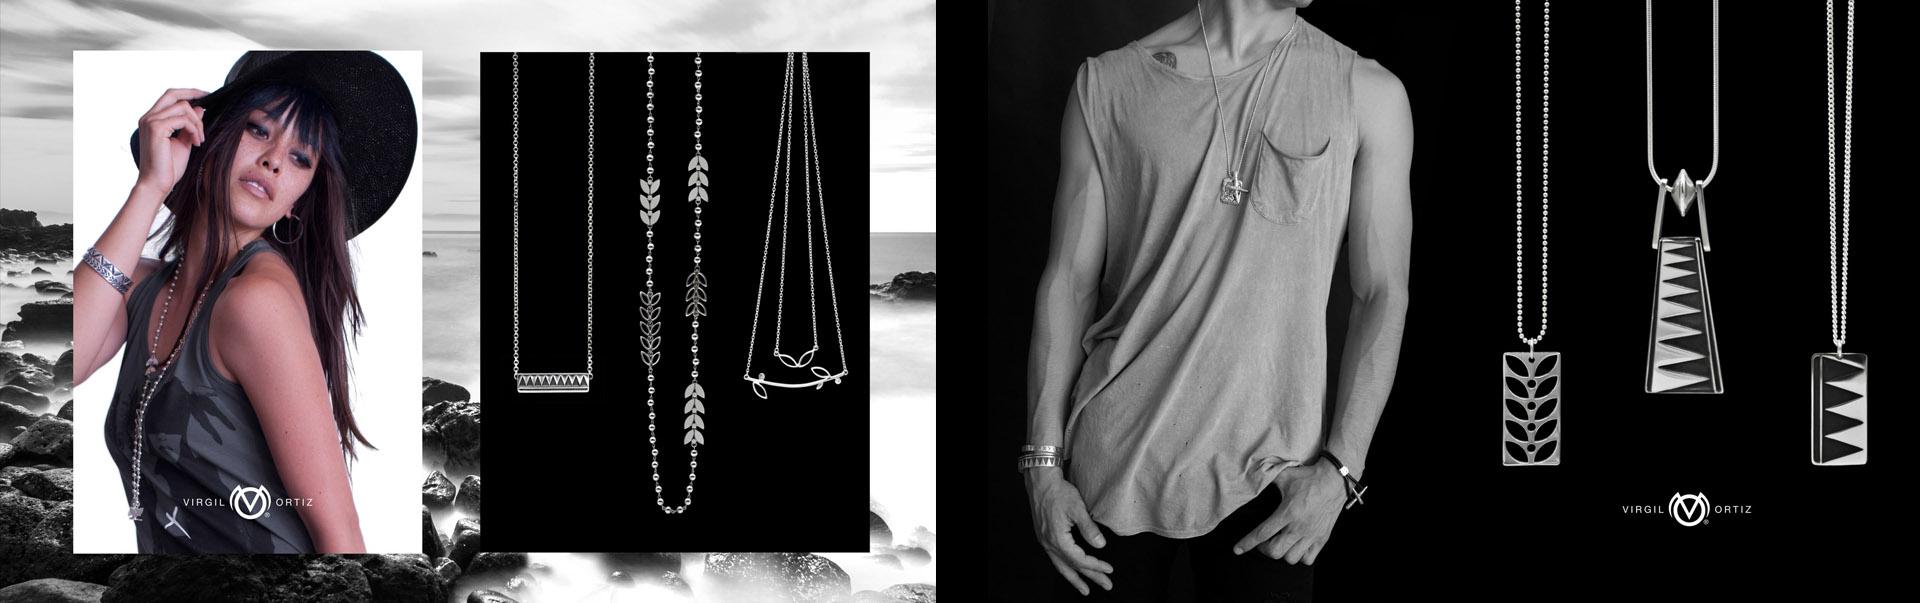 Jewelry_article_5.jpg